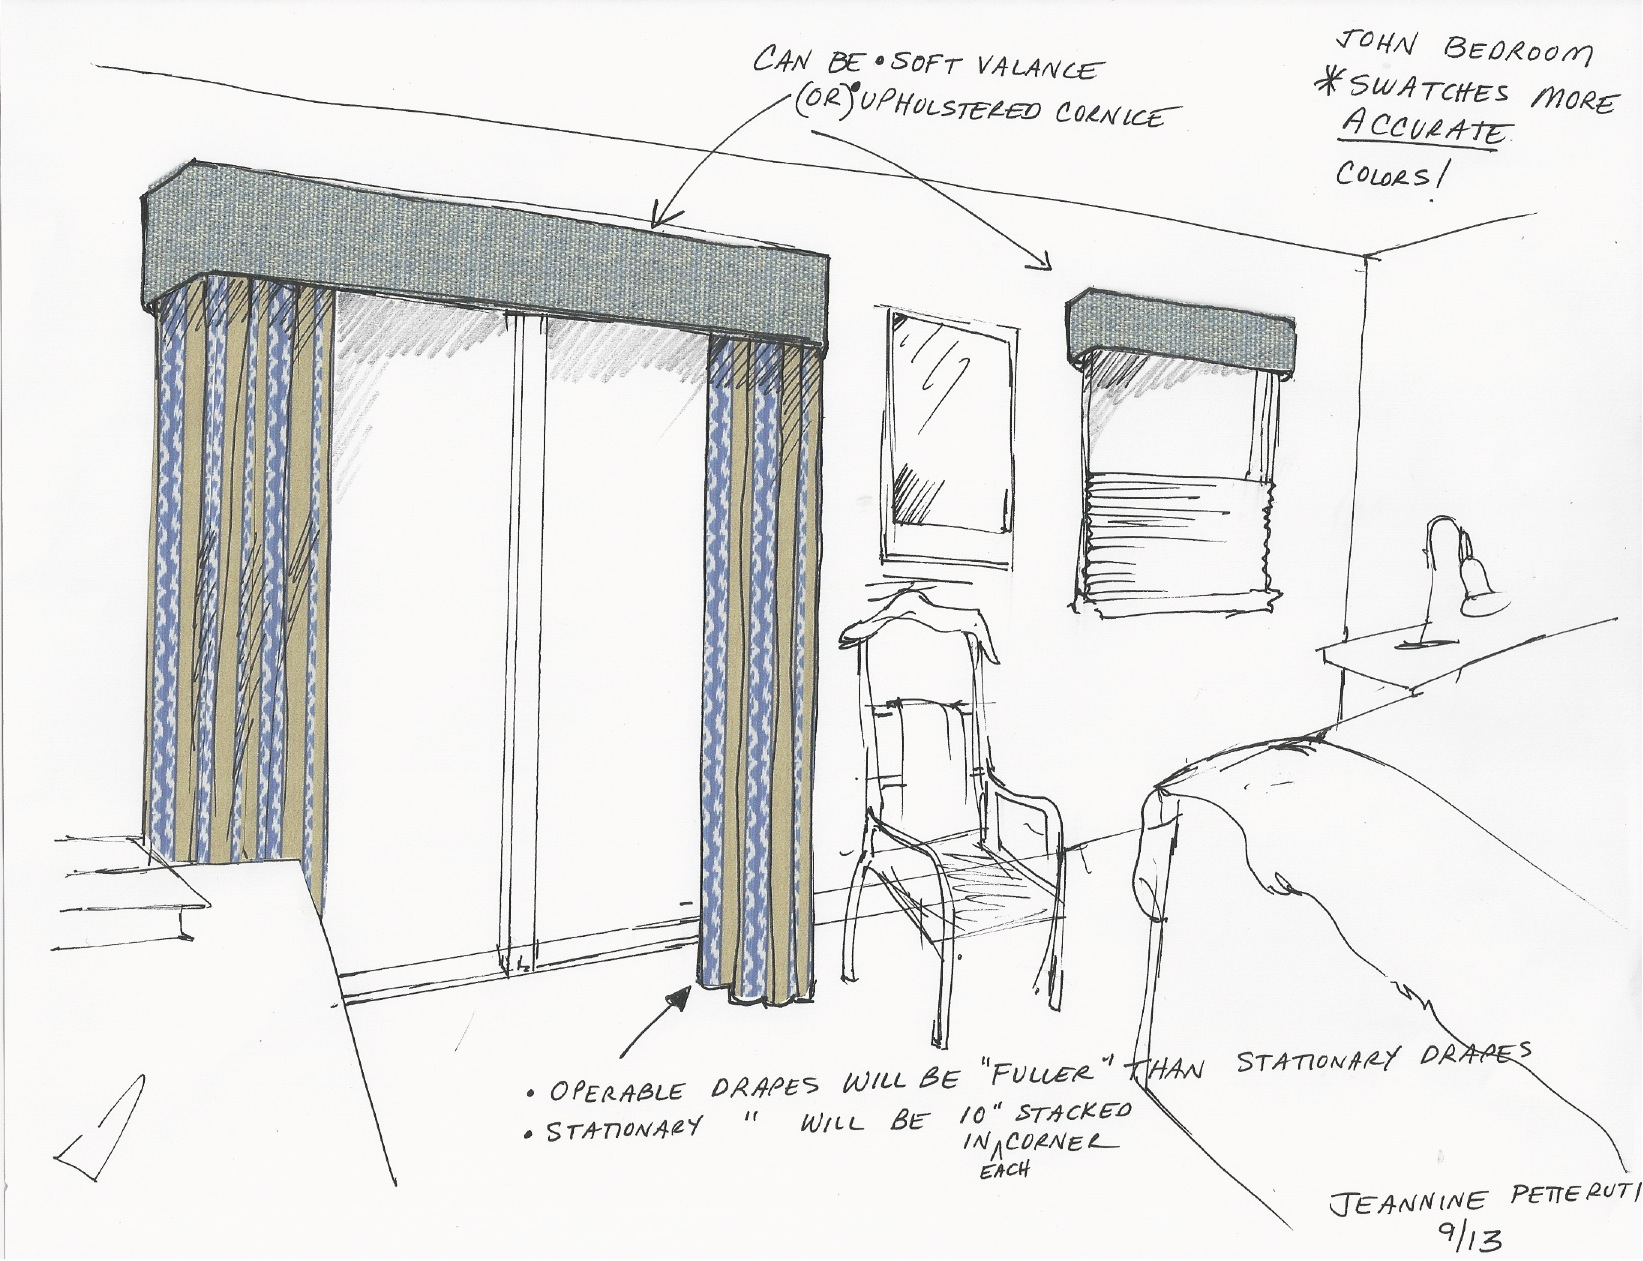 John Bedroom sketch.jpg